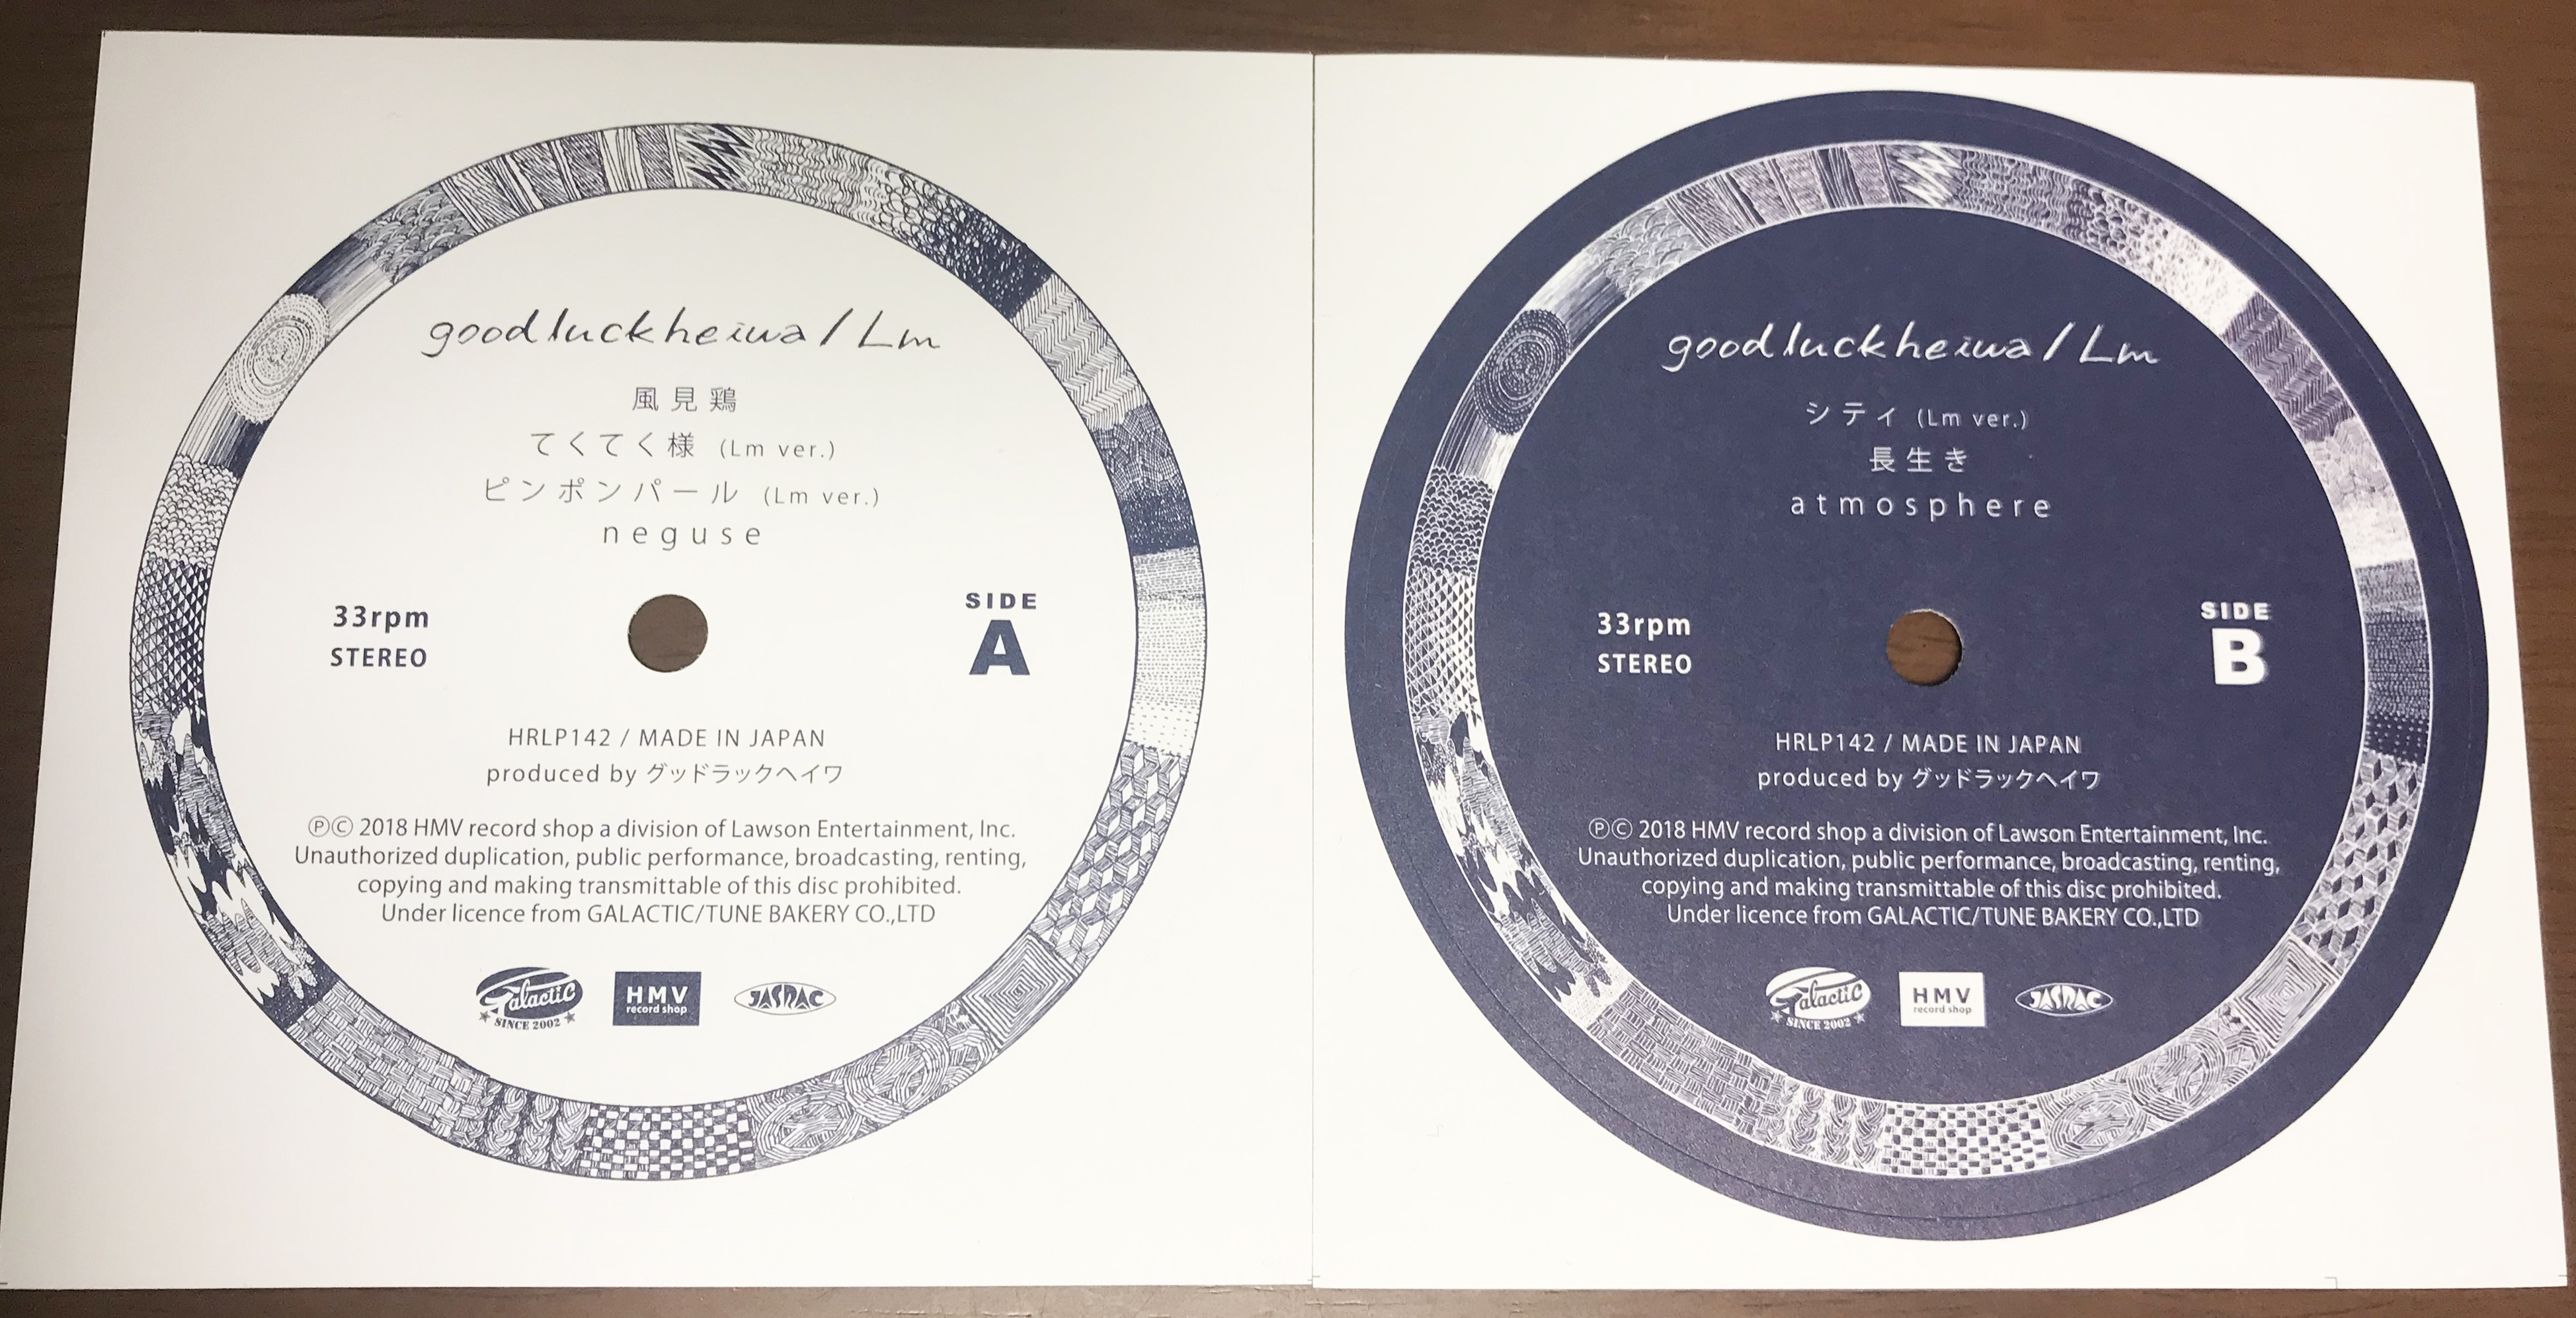 http://goodluckheiwa.galactic-label.jp/news/IMG_1052.jpg